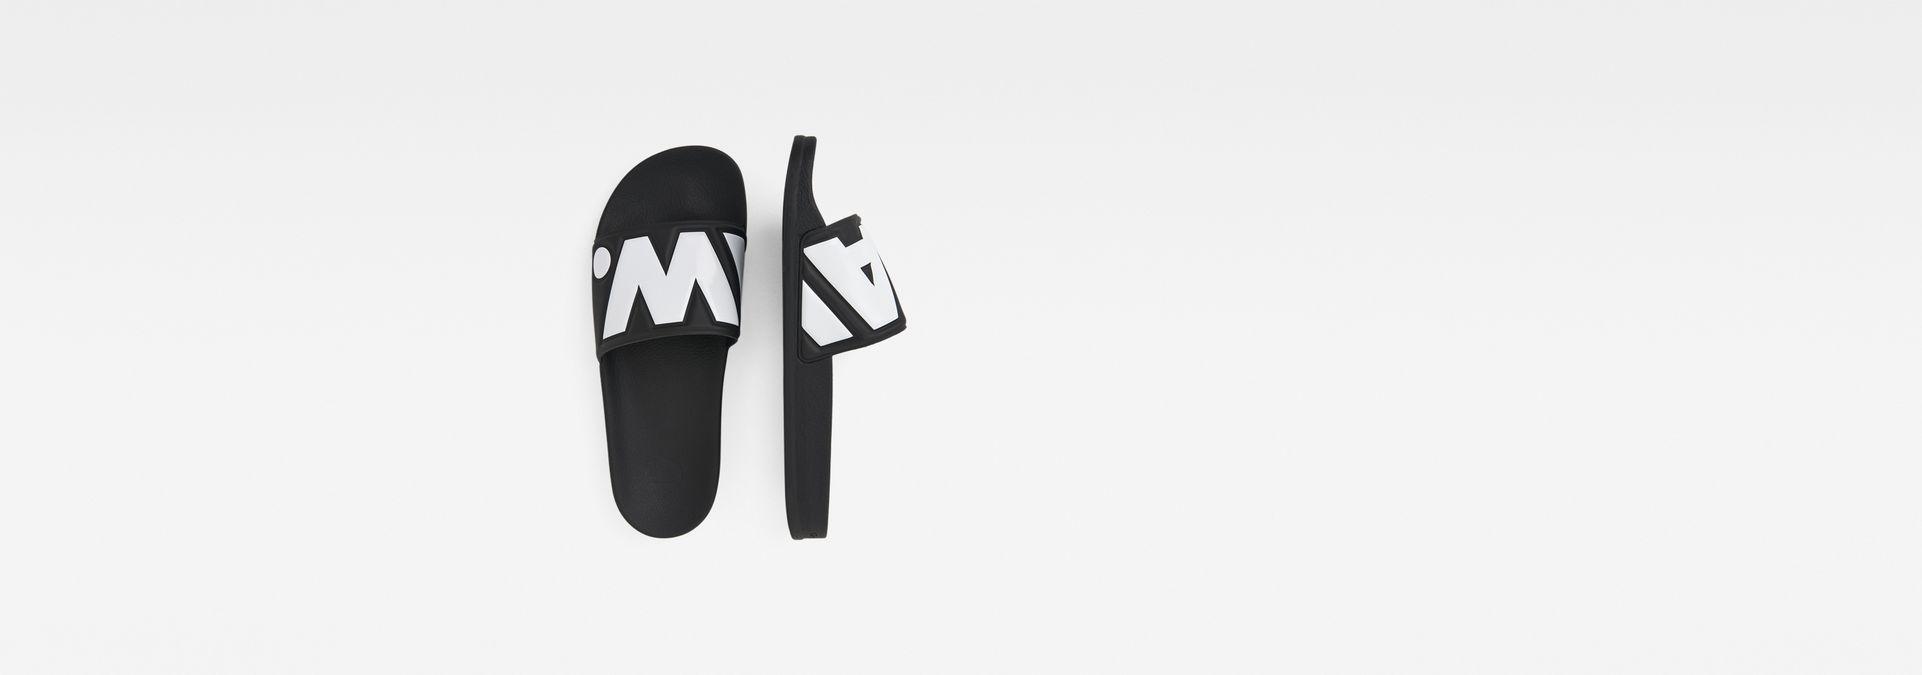 0de92031b9be ... G-Star RAW® Cart Slide II Black both shoes ...